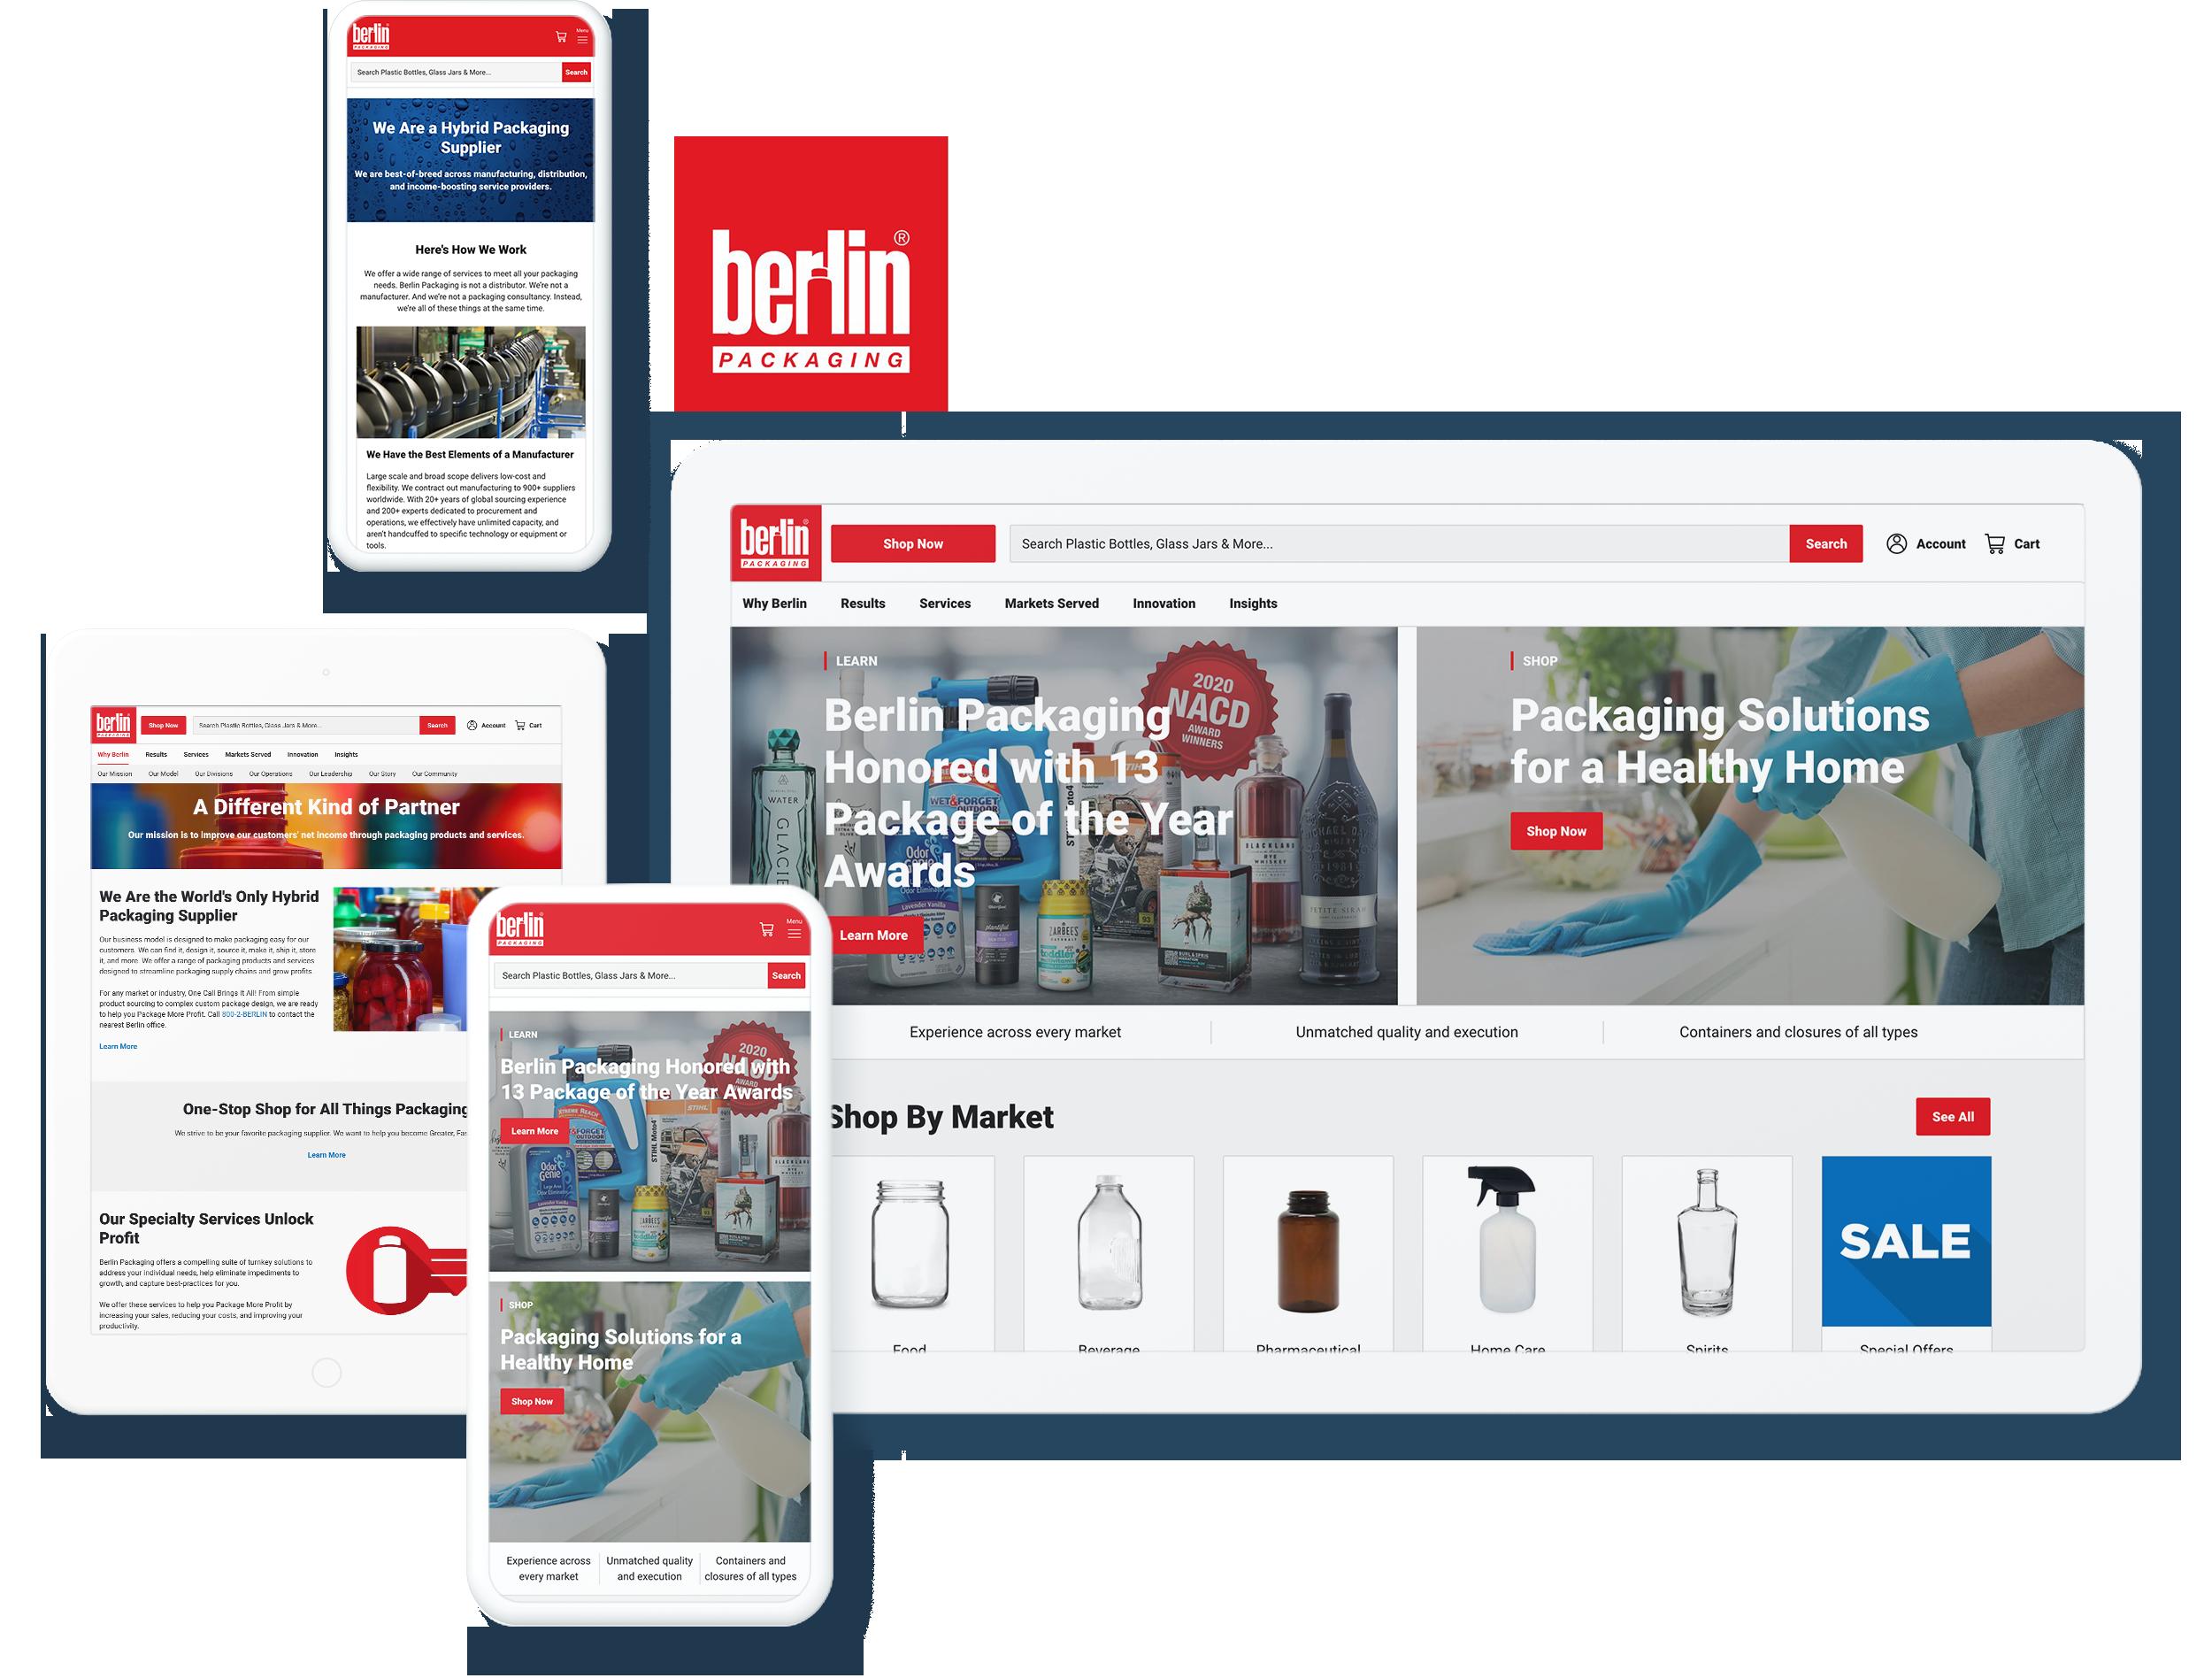 Freund Container & Supply Screens